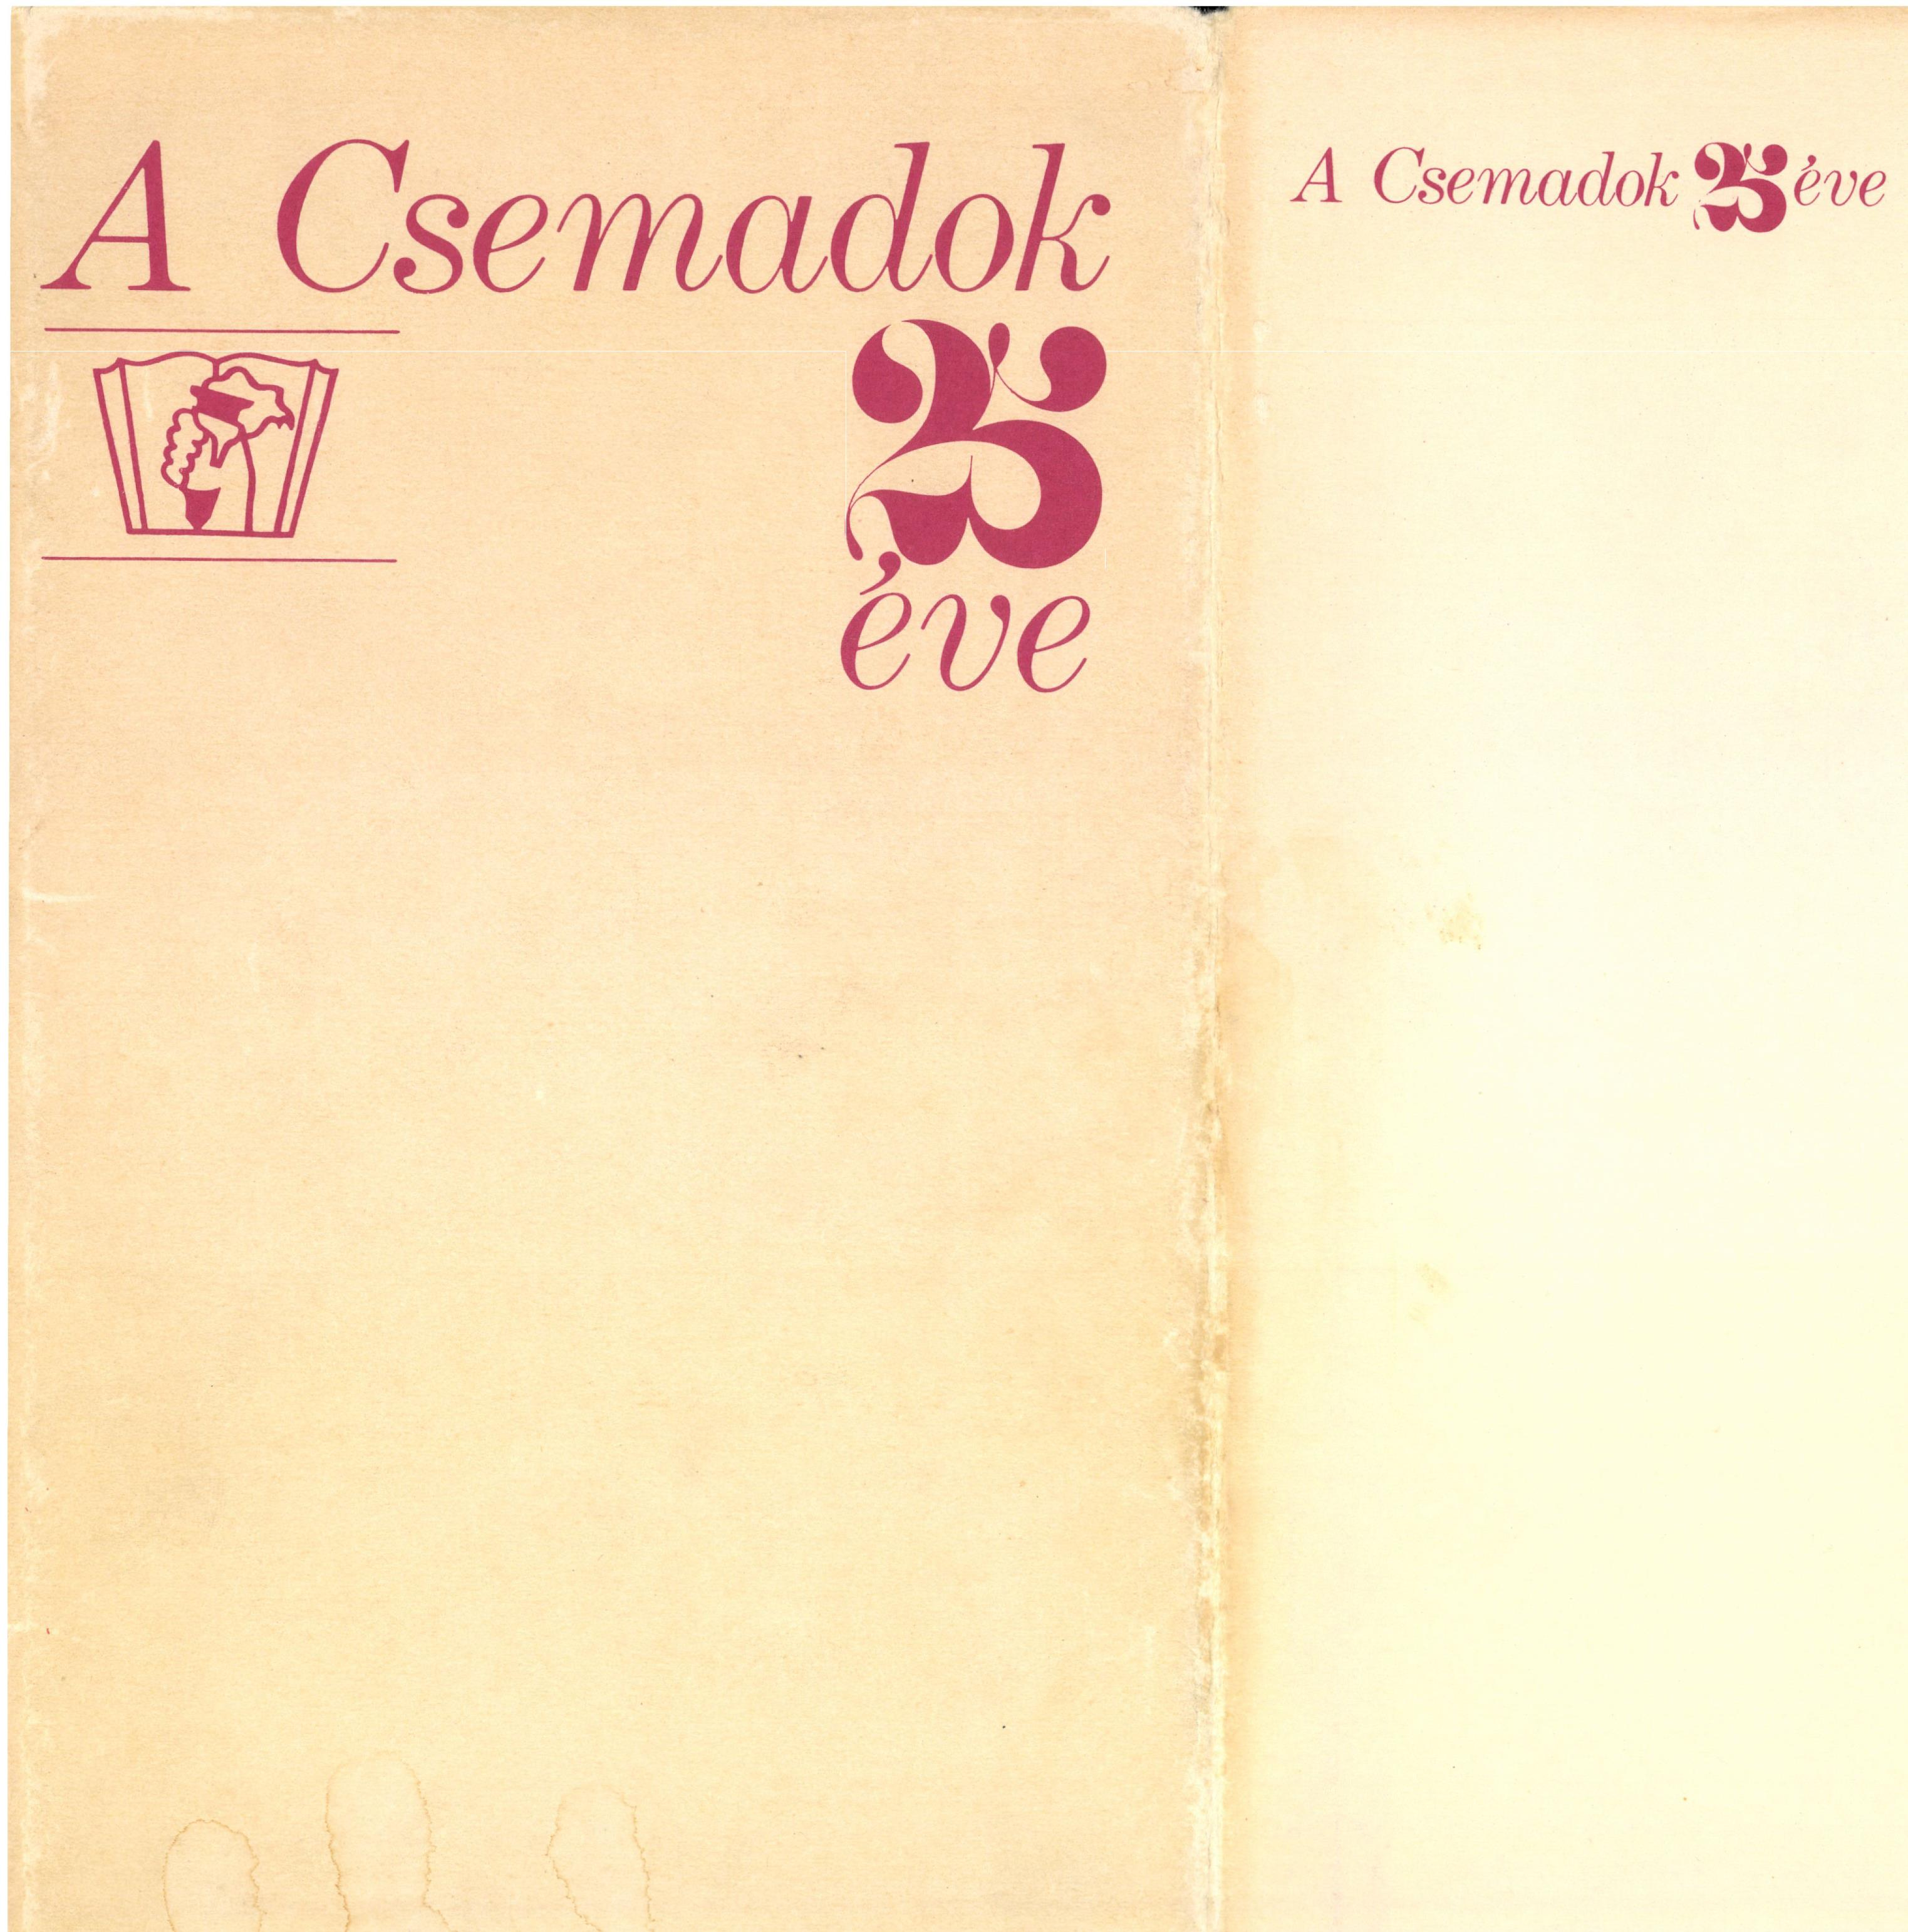 25 years of Csemadok: 1949-1974